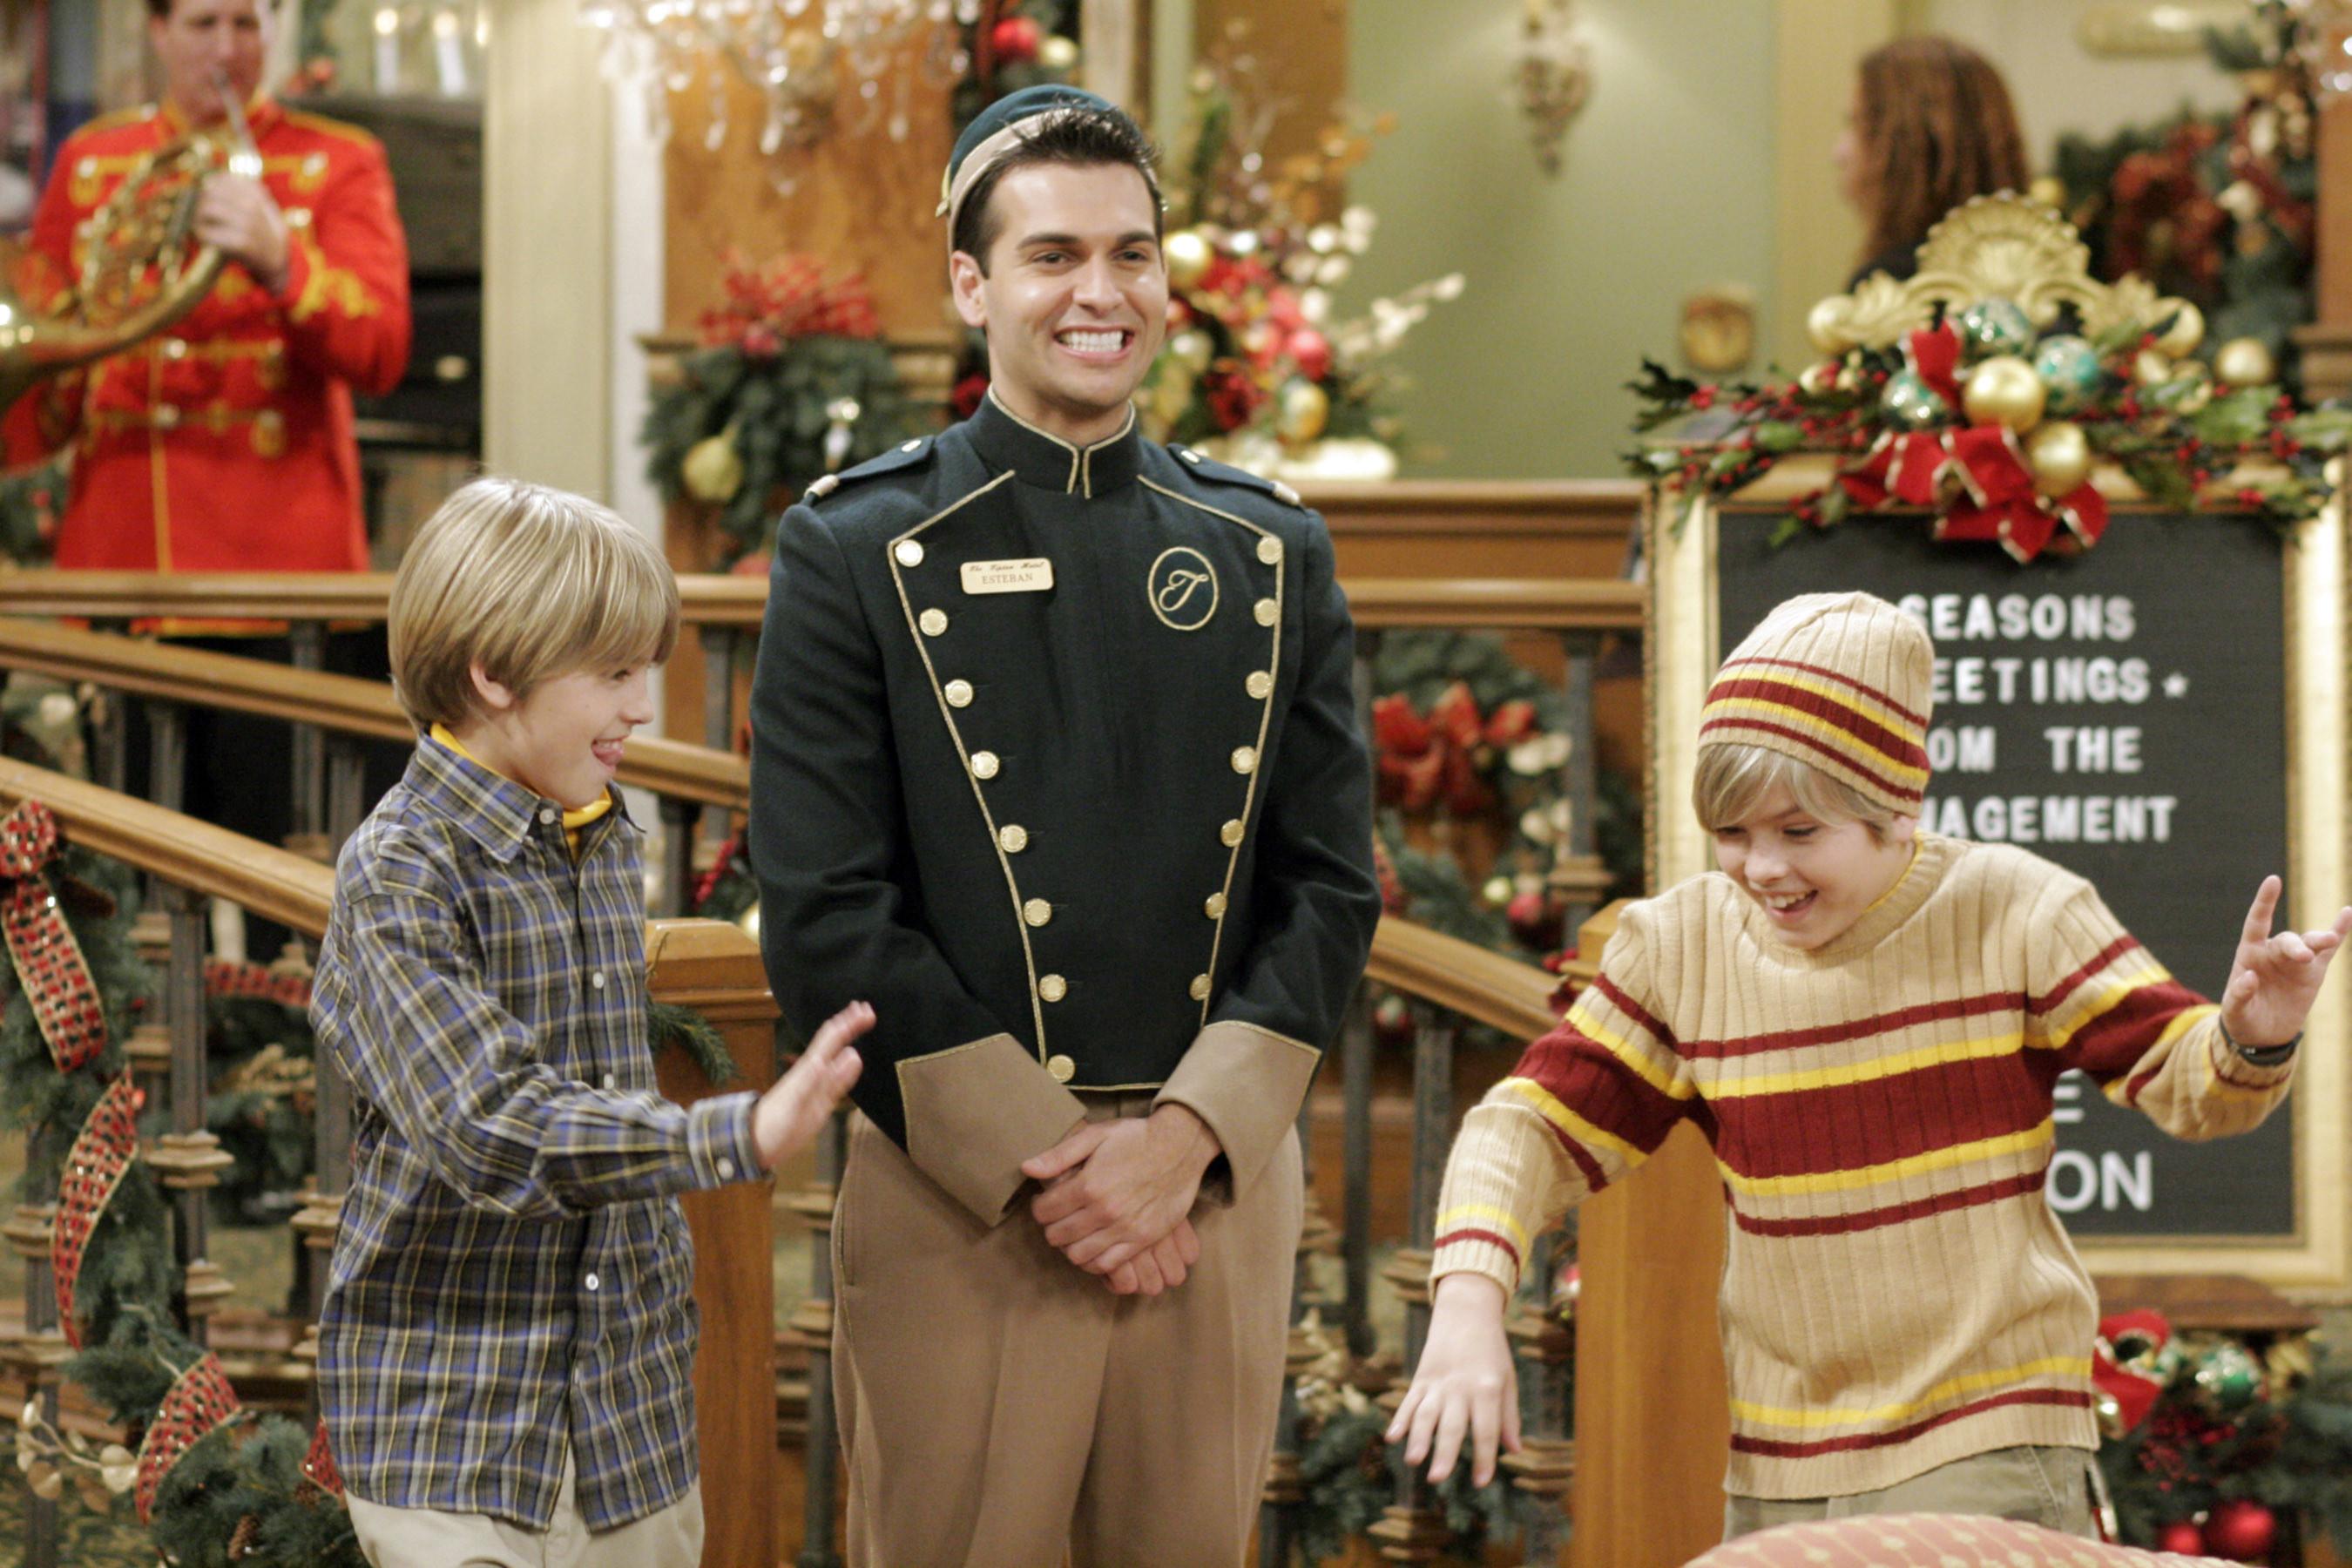 Esteban smiling next to Zack and Cody